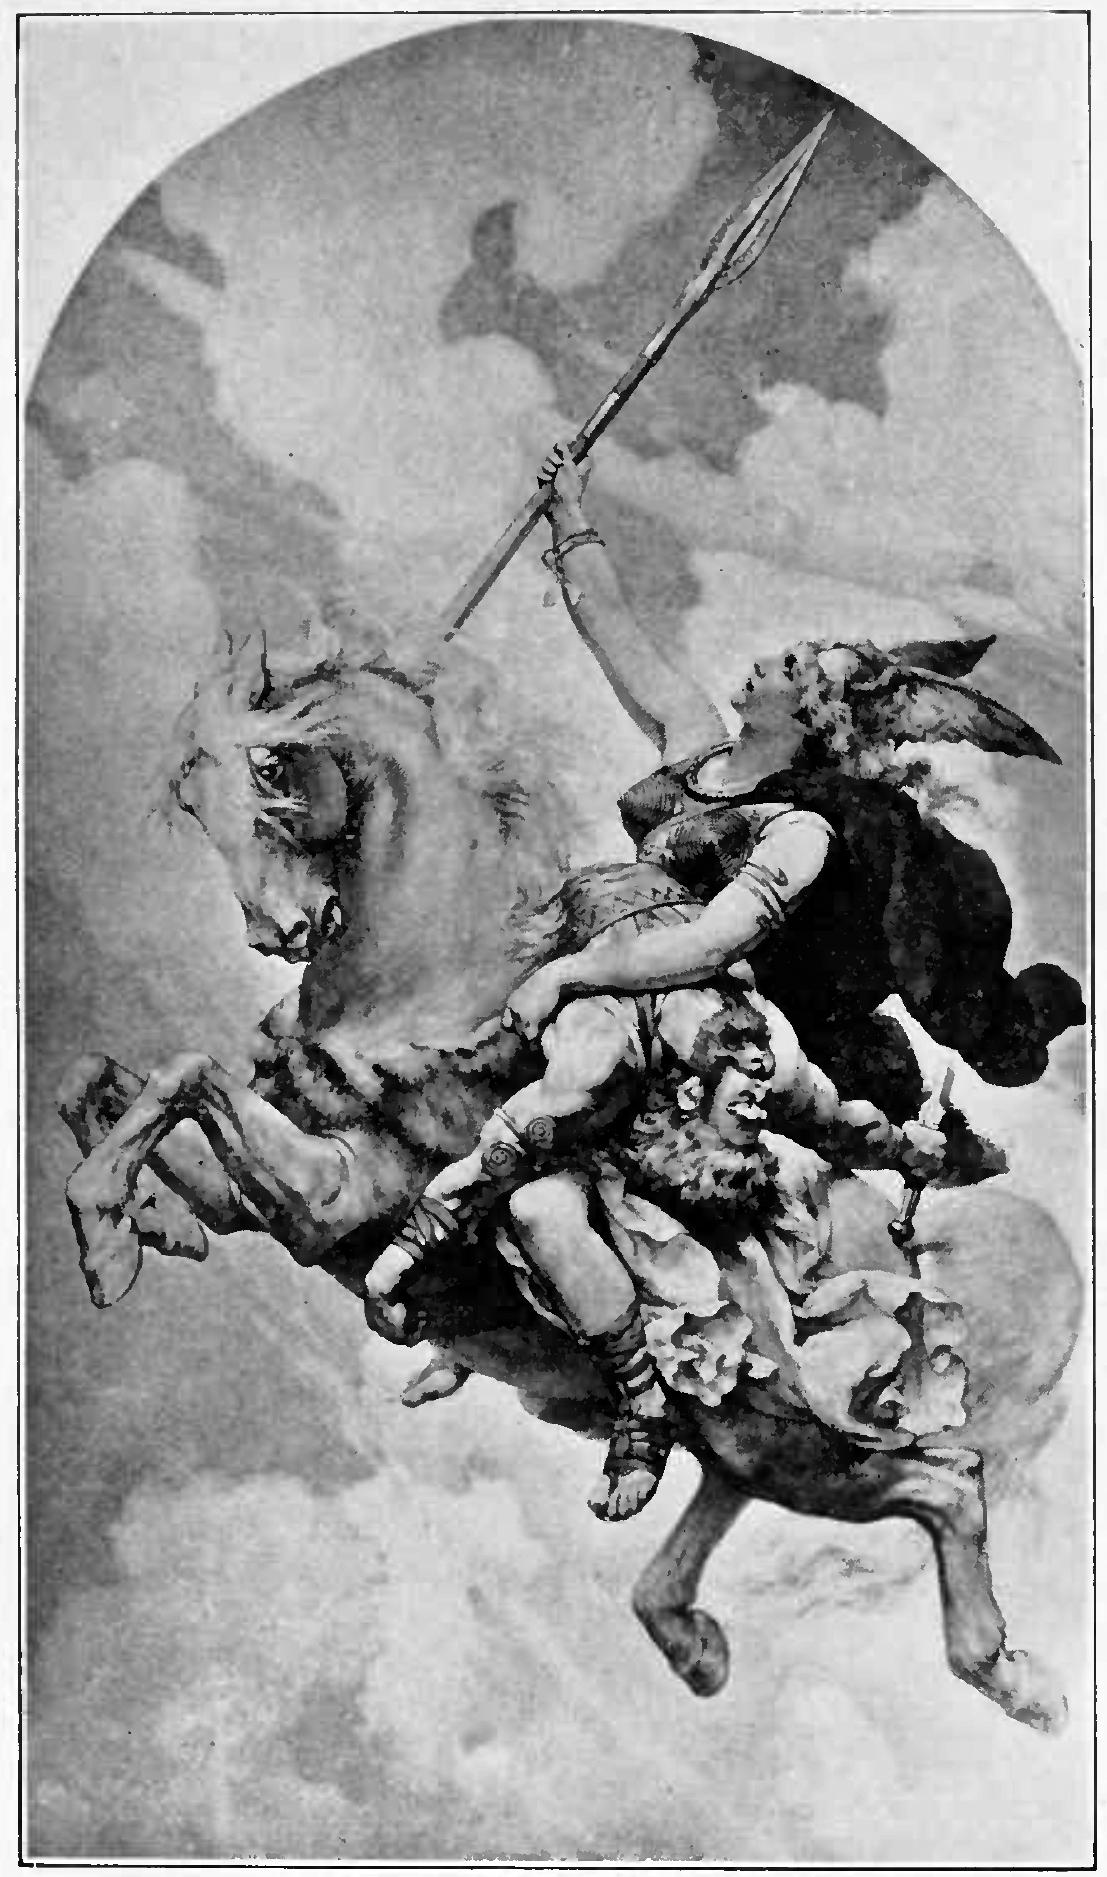 Valkyrie mang tử sĩ về Valhalla (1914) – khuyết danh